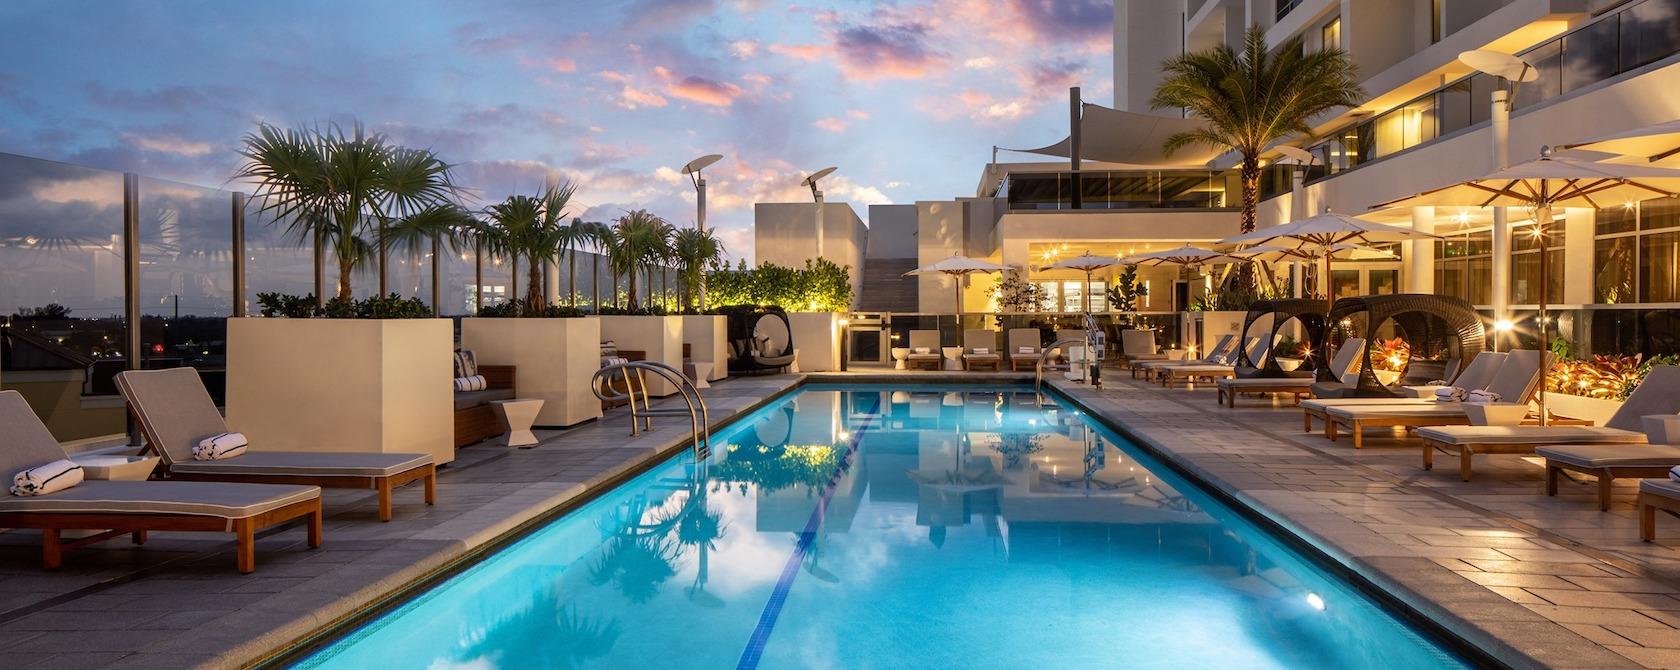 Pool at the Hilton Aventura Miami at sunset